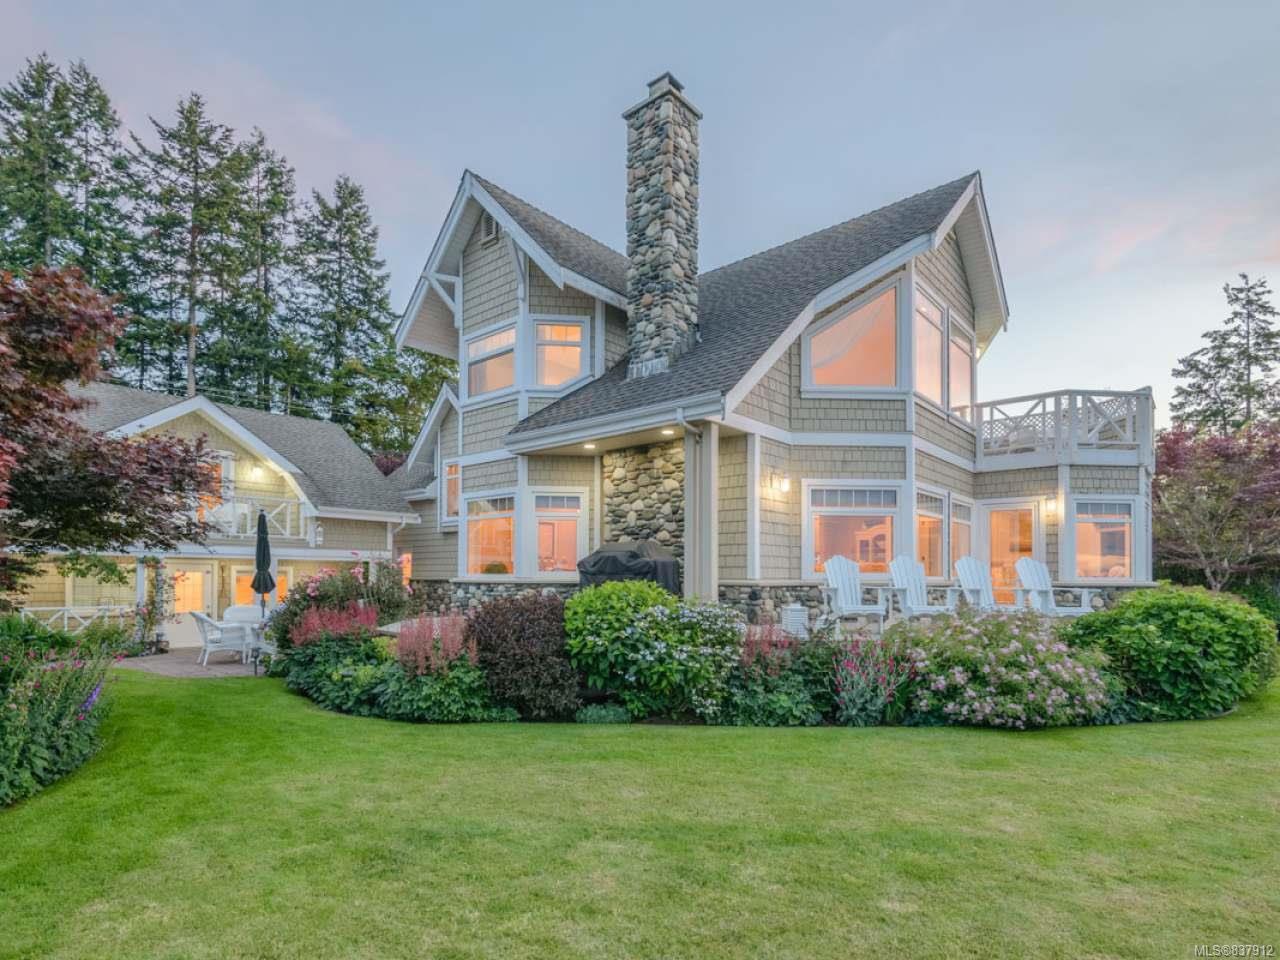 Main Photo: 5525 W Island Hwy in QUALICUM BEACH: PQ Qualicum North House for sale (Parksville/Qualicum)  : MLS®# 837912